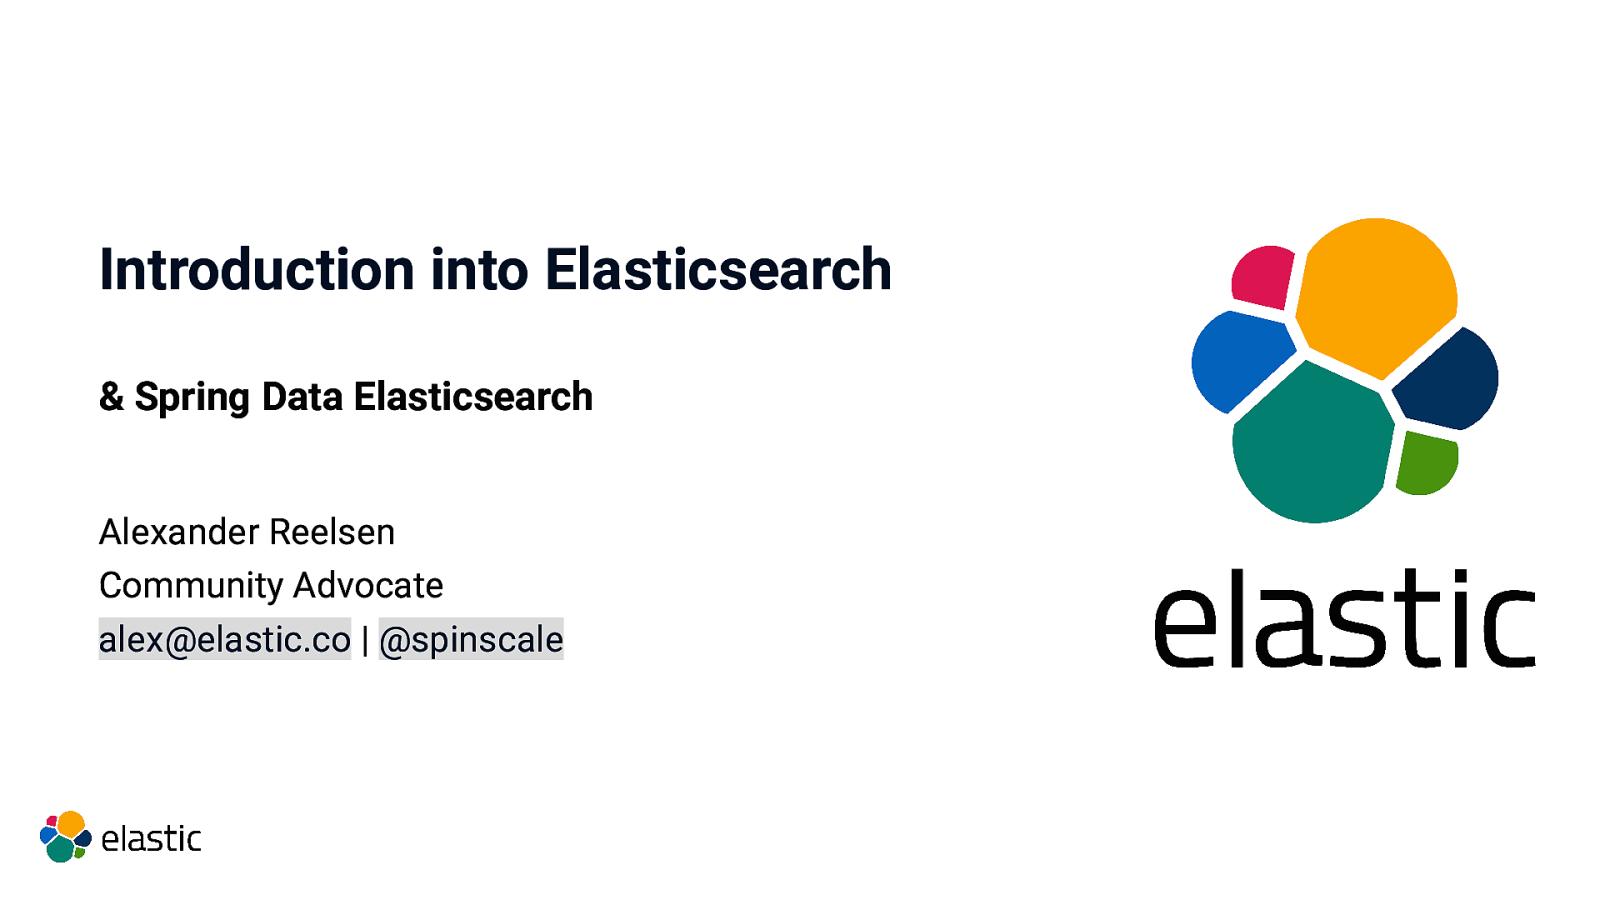 Introduction into Elasticsearch & Spring Data Elasticsearch